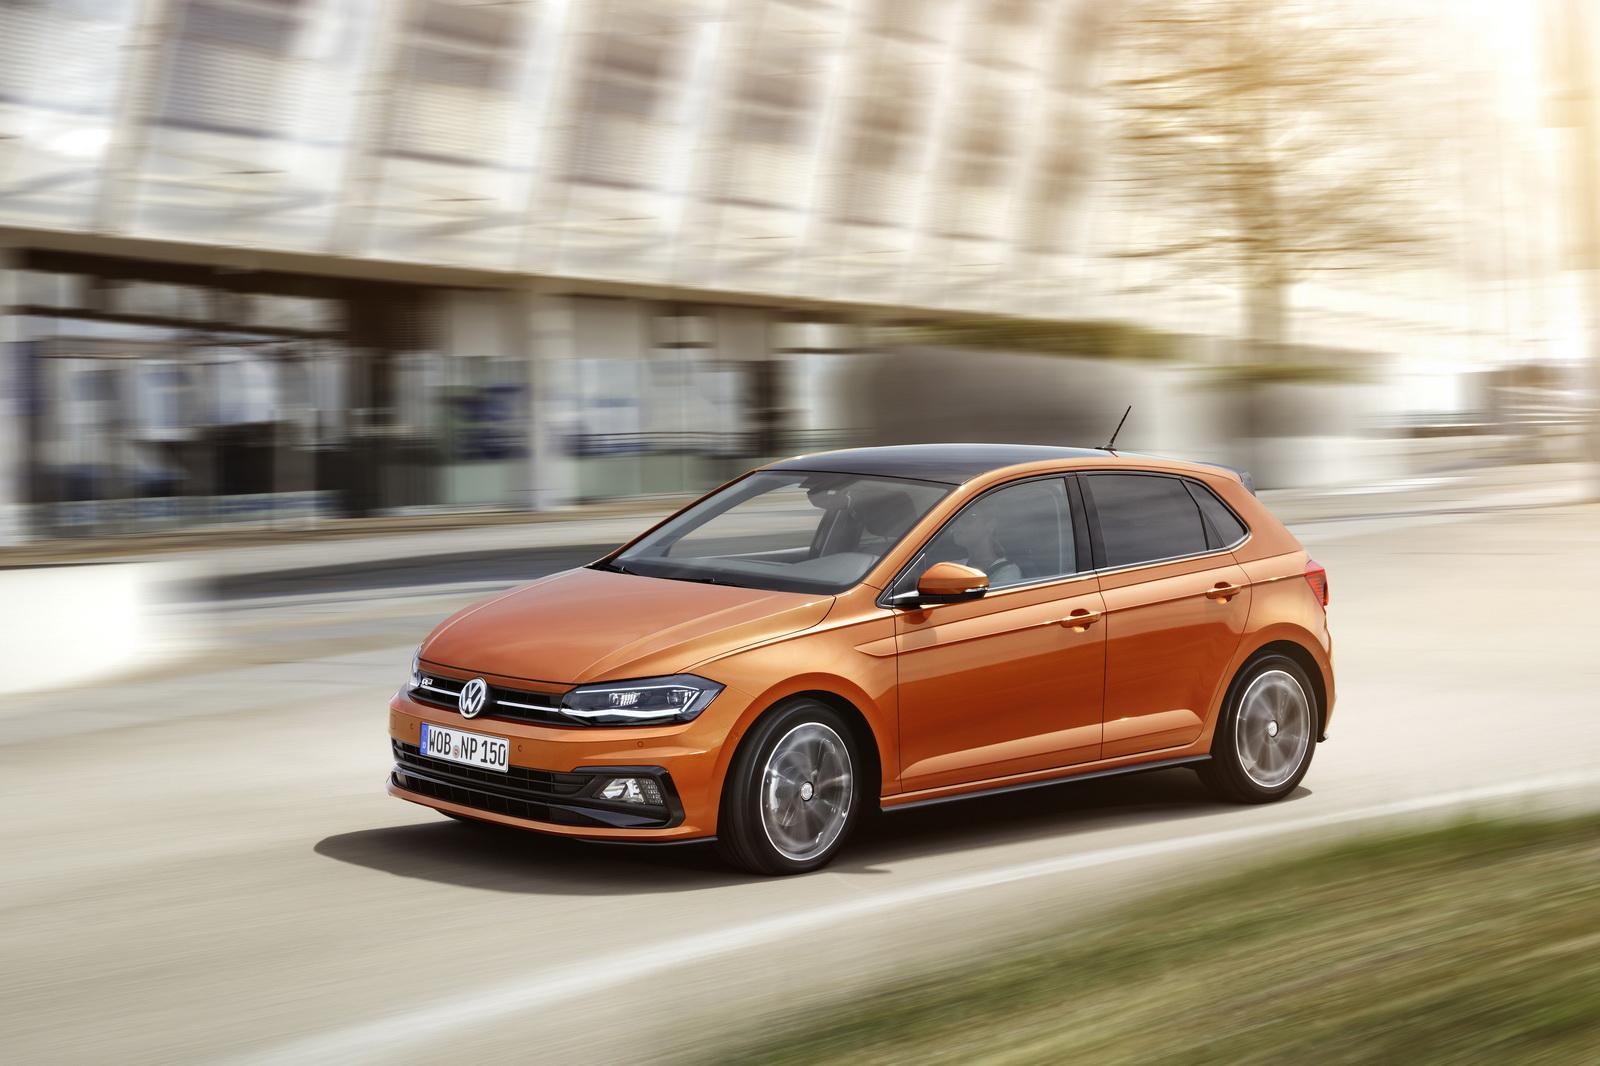 Photo of Πρόγραμμα εφαρμογής προληπτικών μέτρων σε αυτοκίνητα Volkswagen Polo σχετικά με την πίσω αριστερή ζώνη ασφαλείας